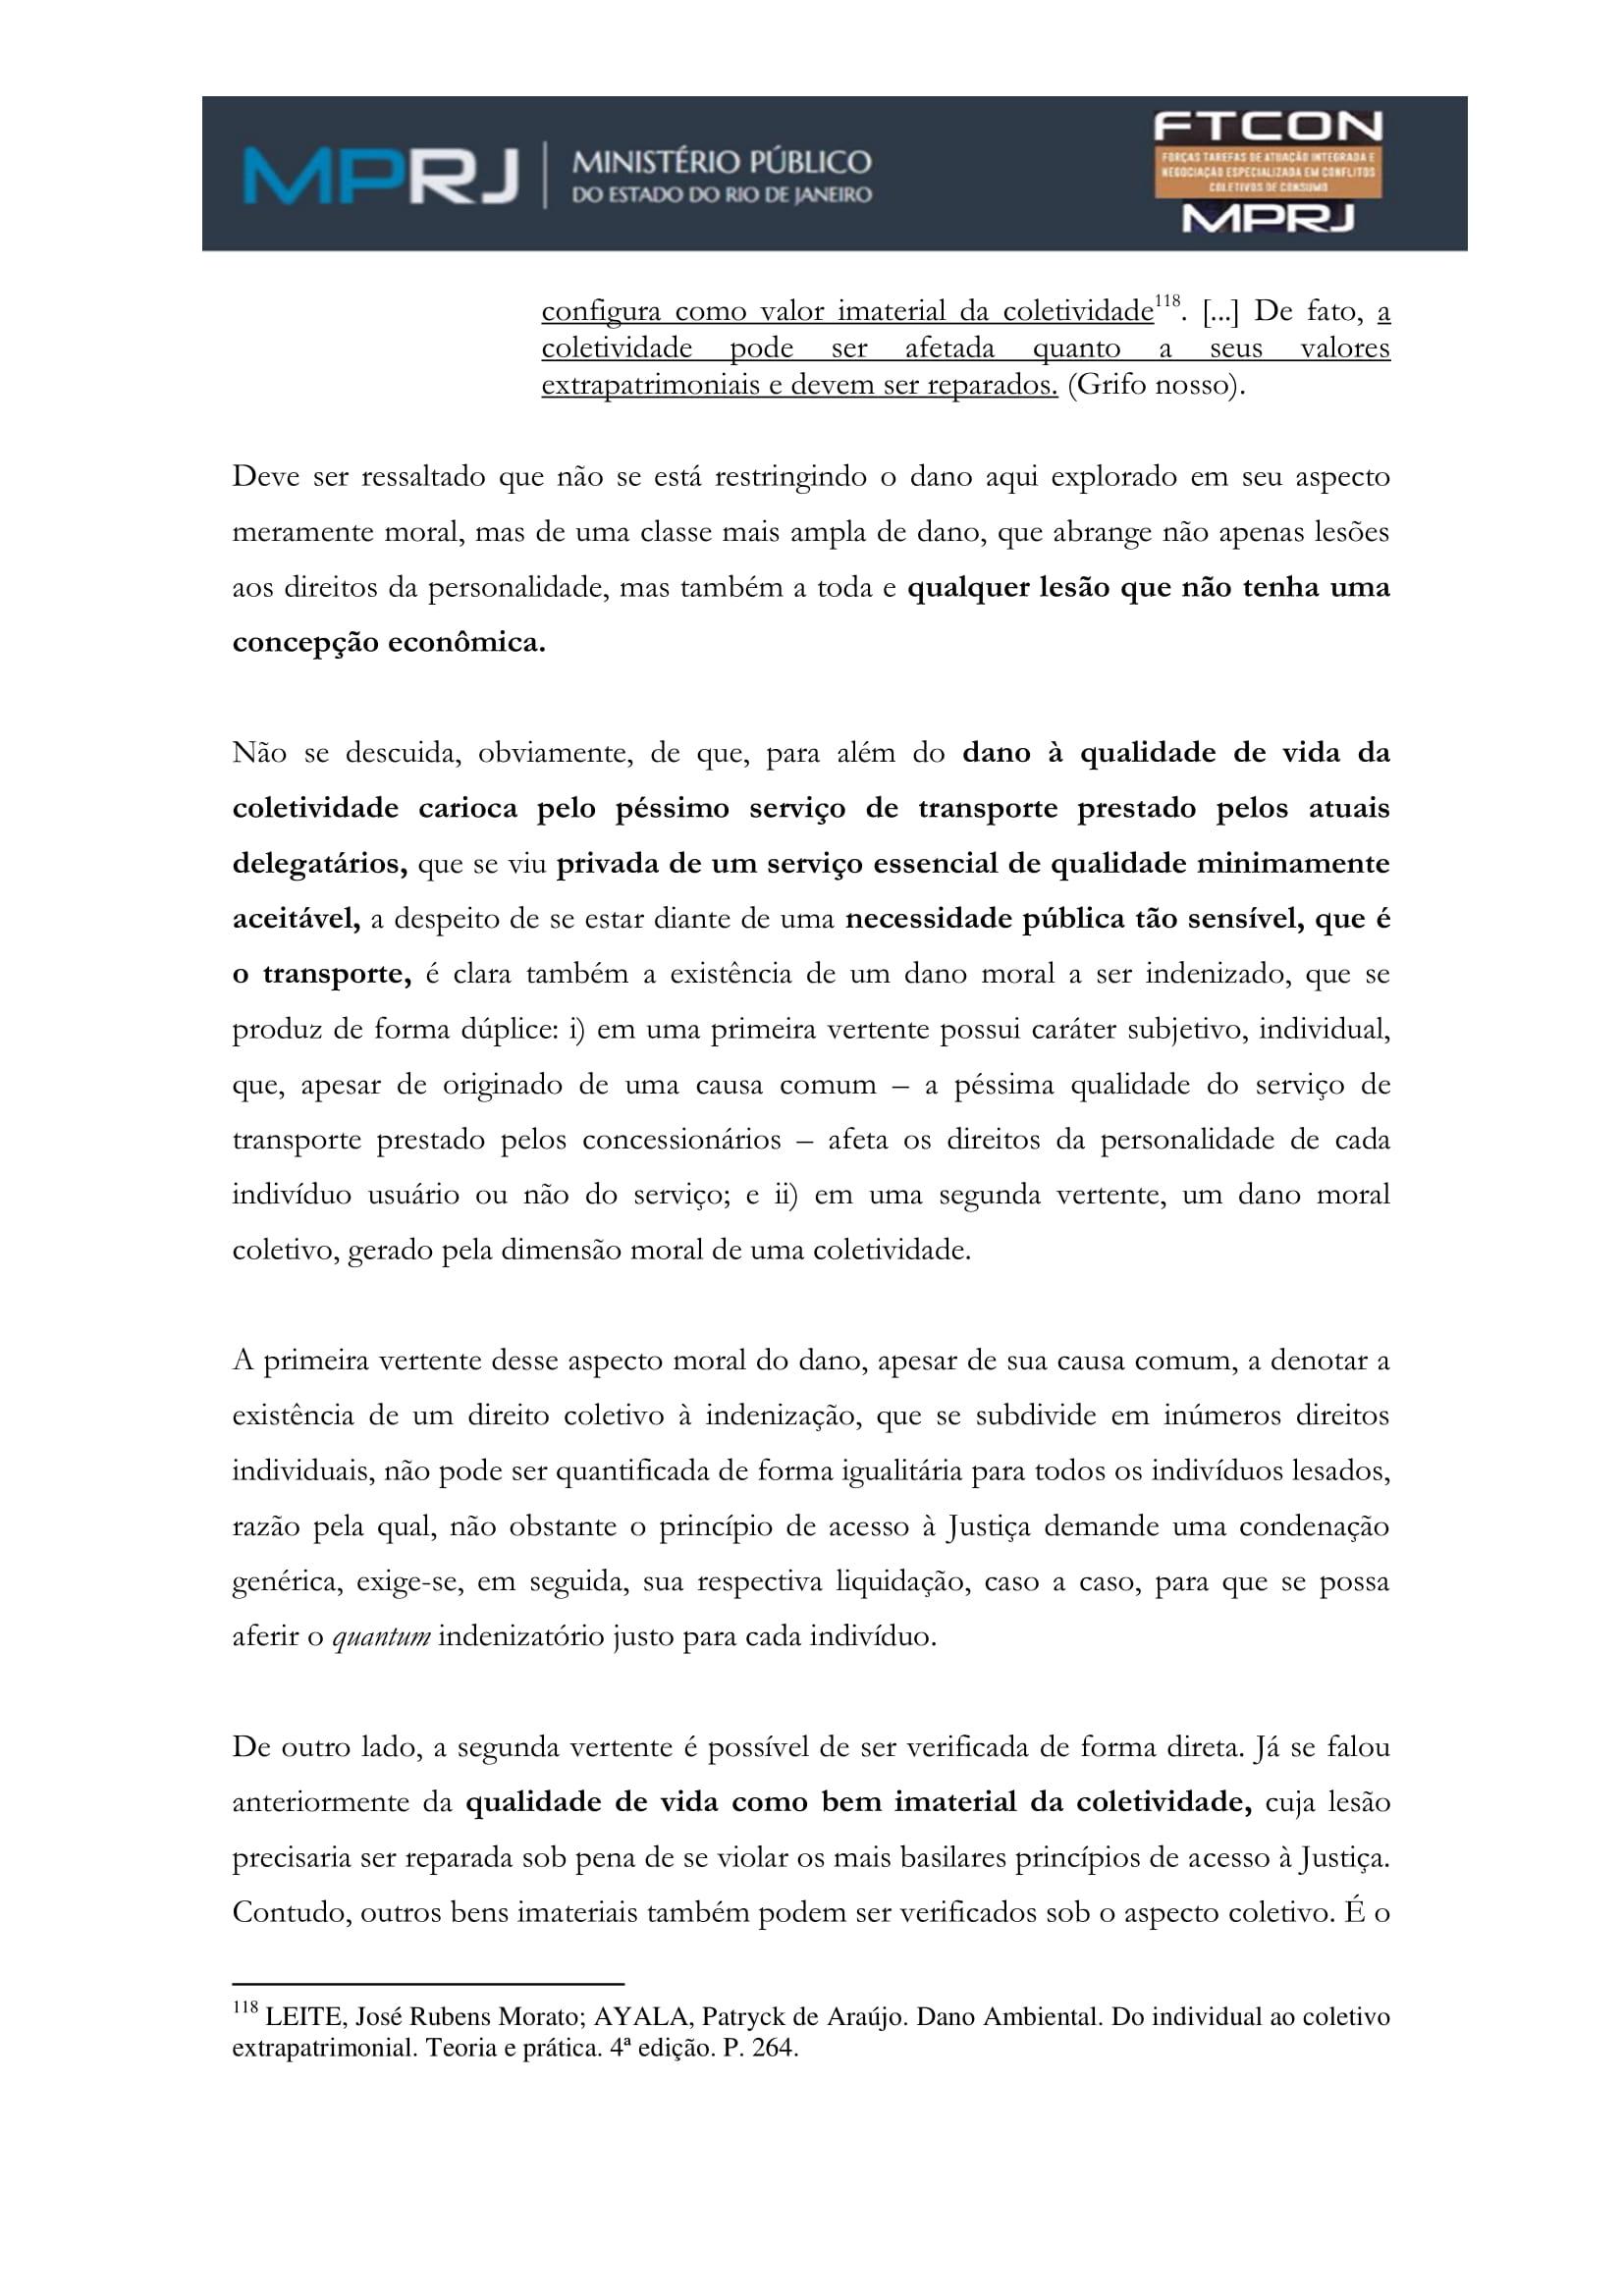 acp_caducidade_onibus_dr_rt-130